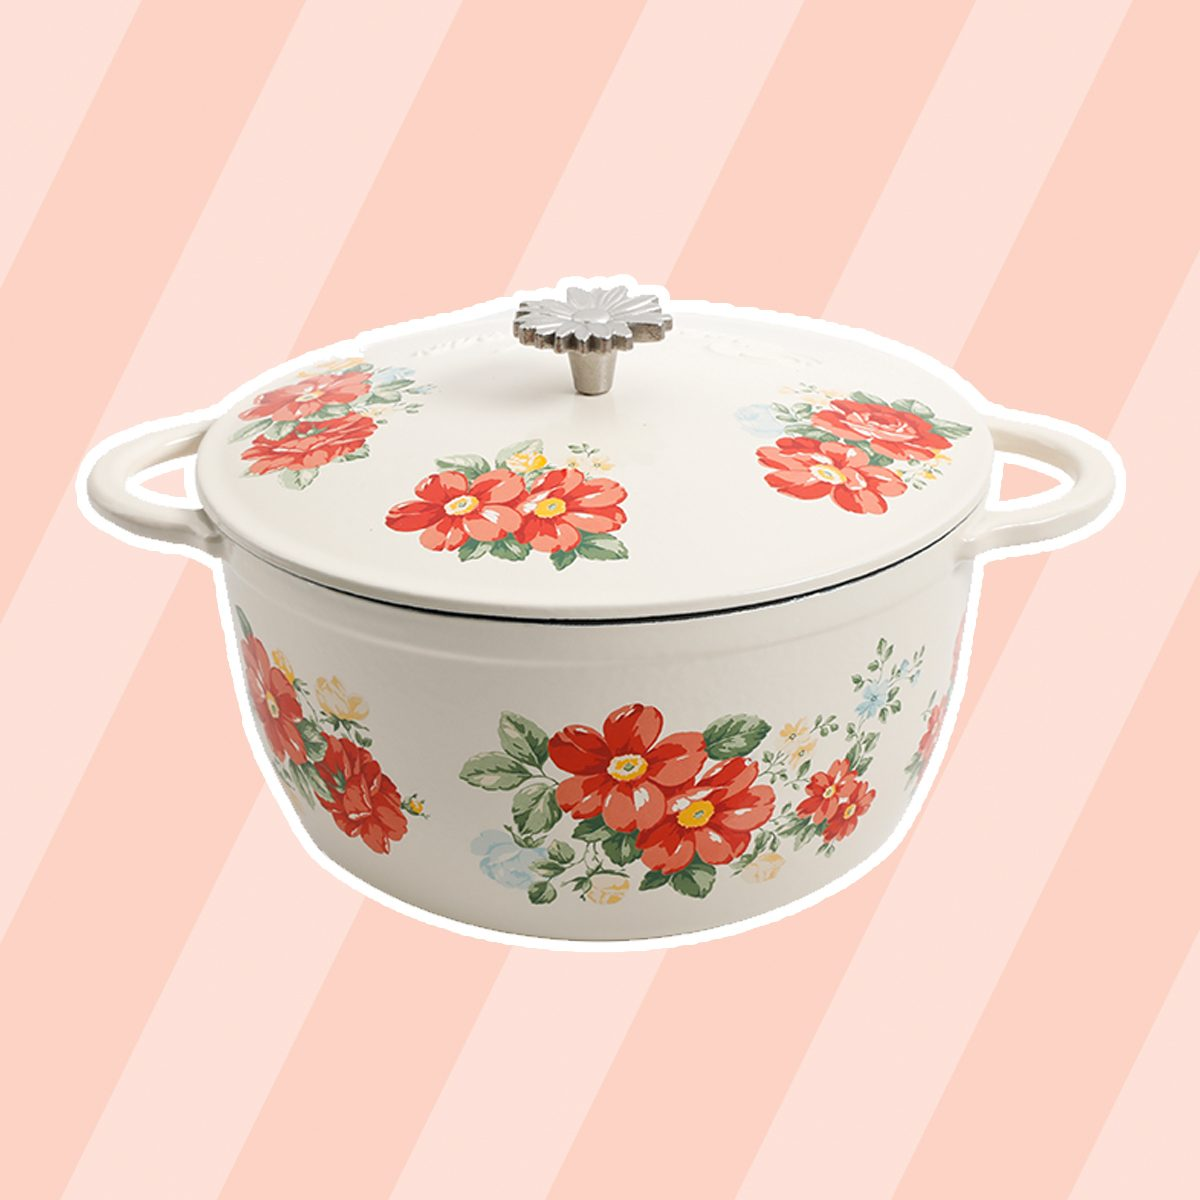 The Pioneer Woman Vintage Floral 5-Quart Dutch Oven